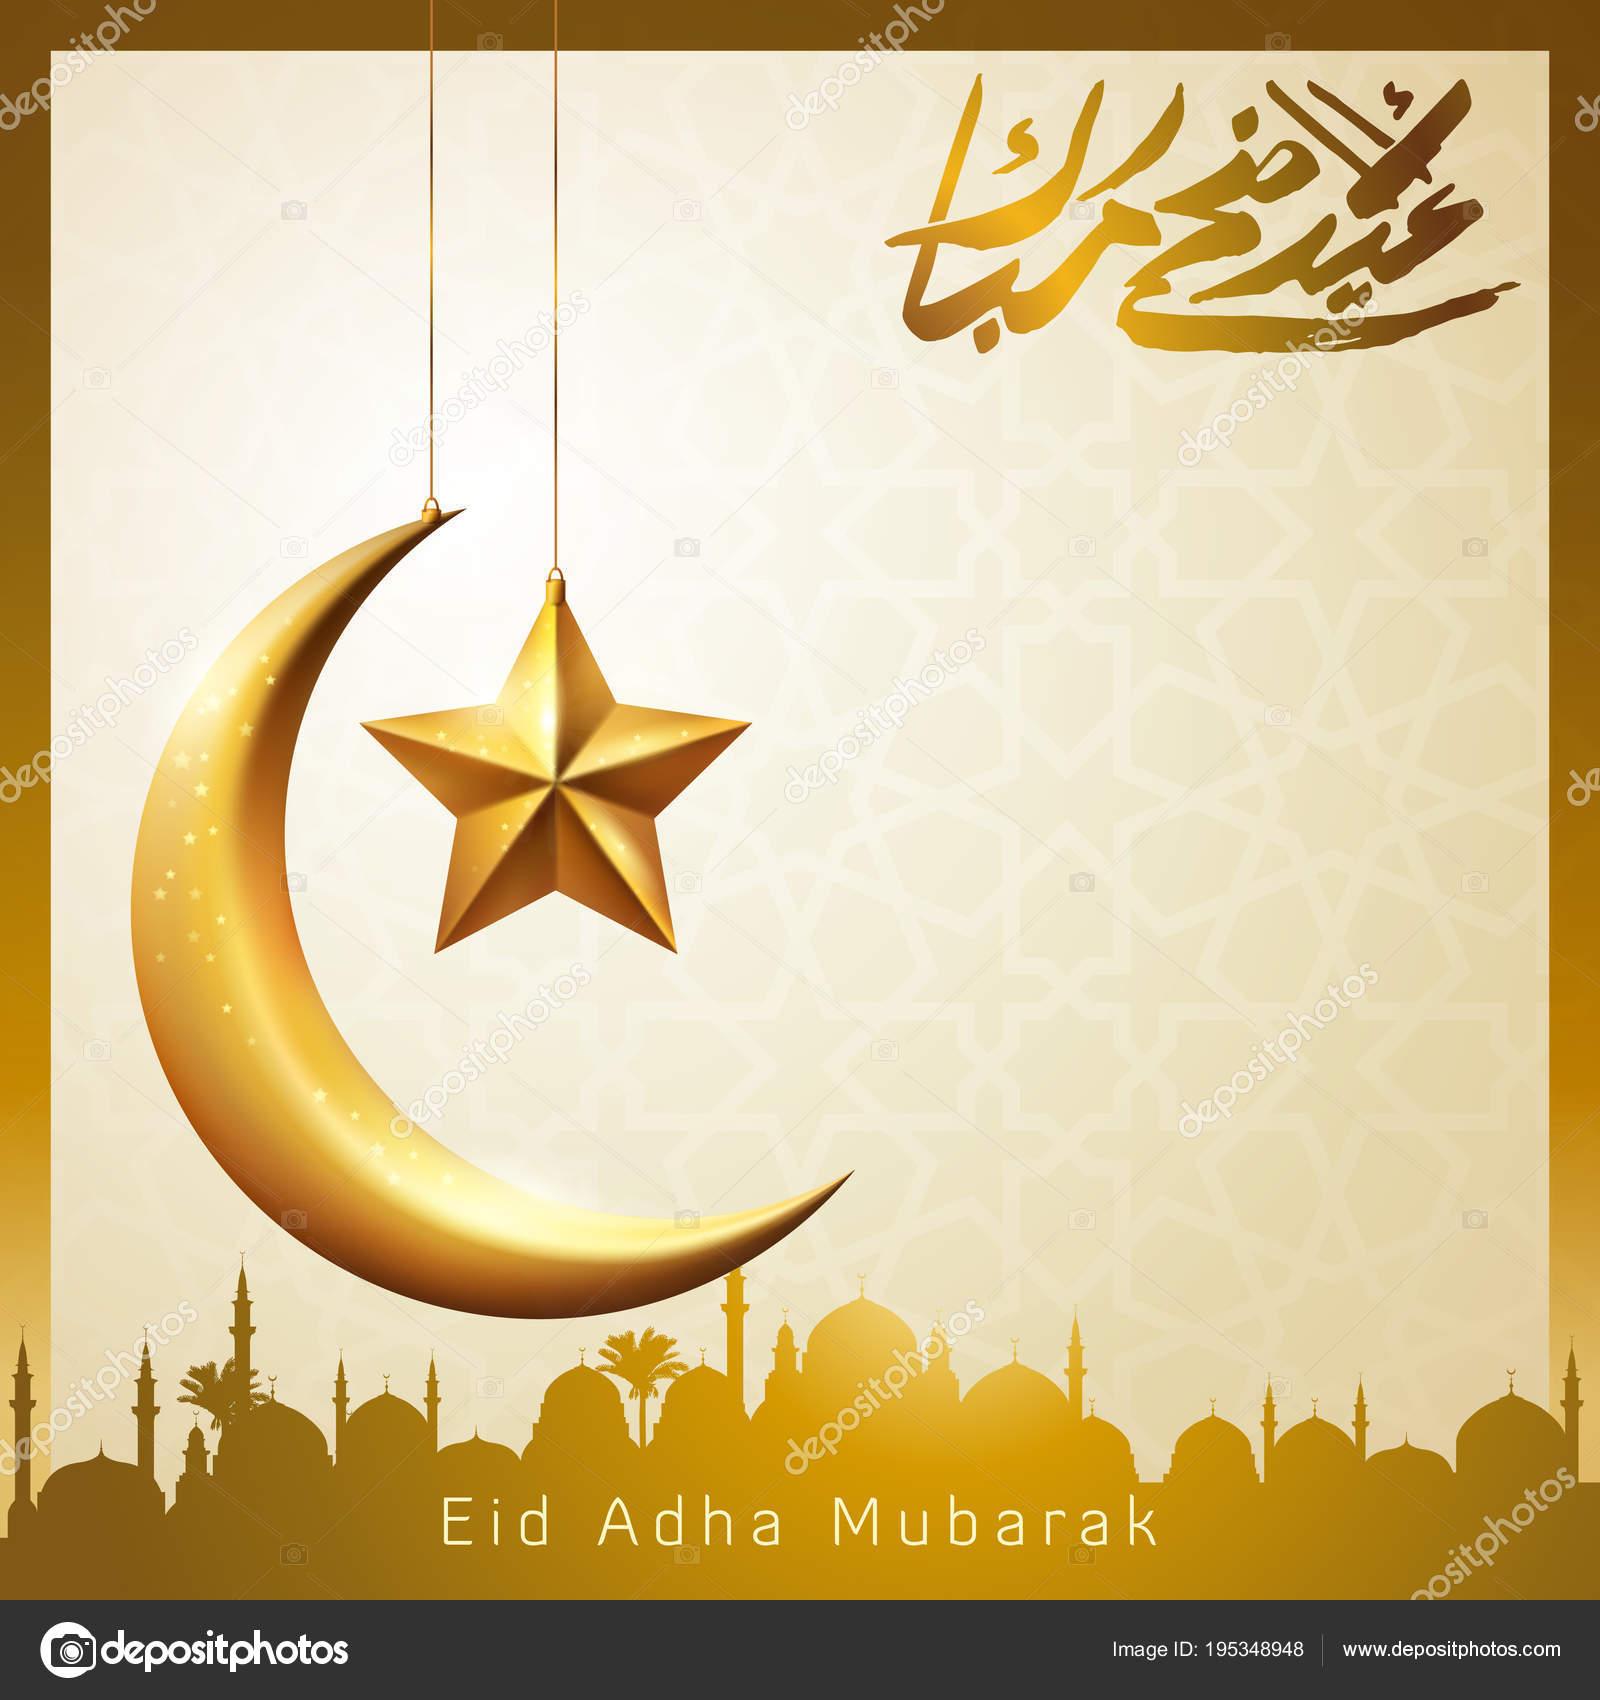 Eid adha mubarak greeting card template islamic crescent vector eid adha mubarak greeting card template islamic crescent vector illustration stock vector m4hsunfo